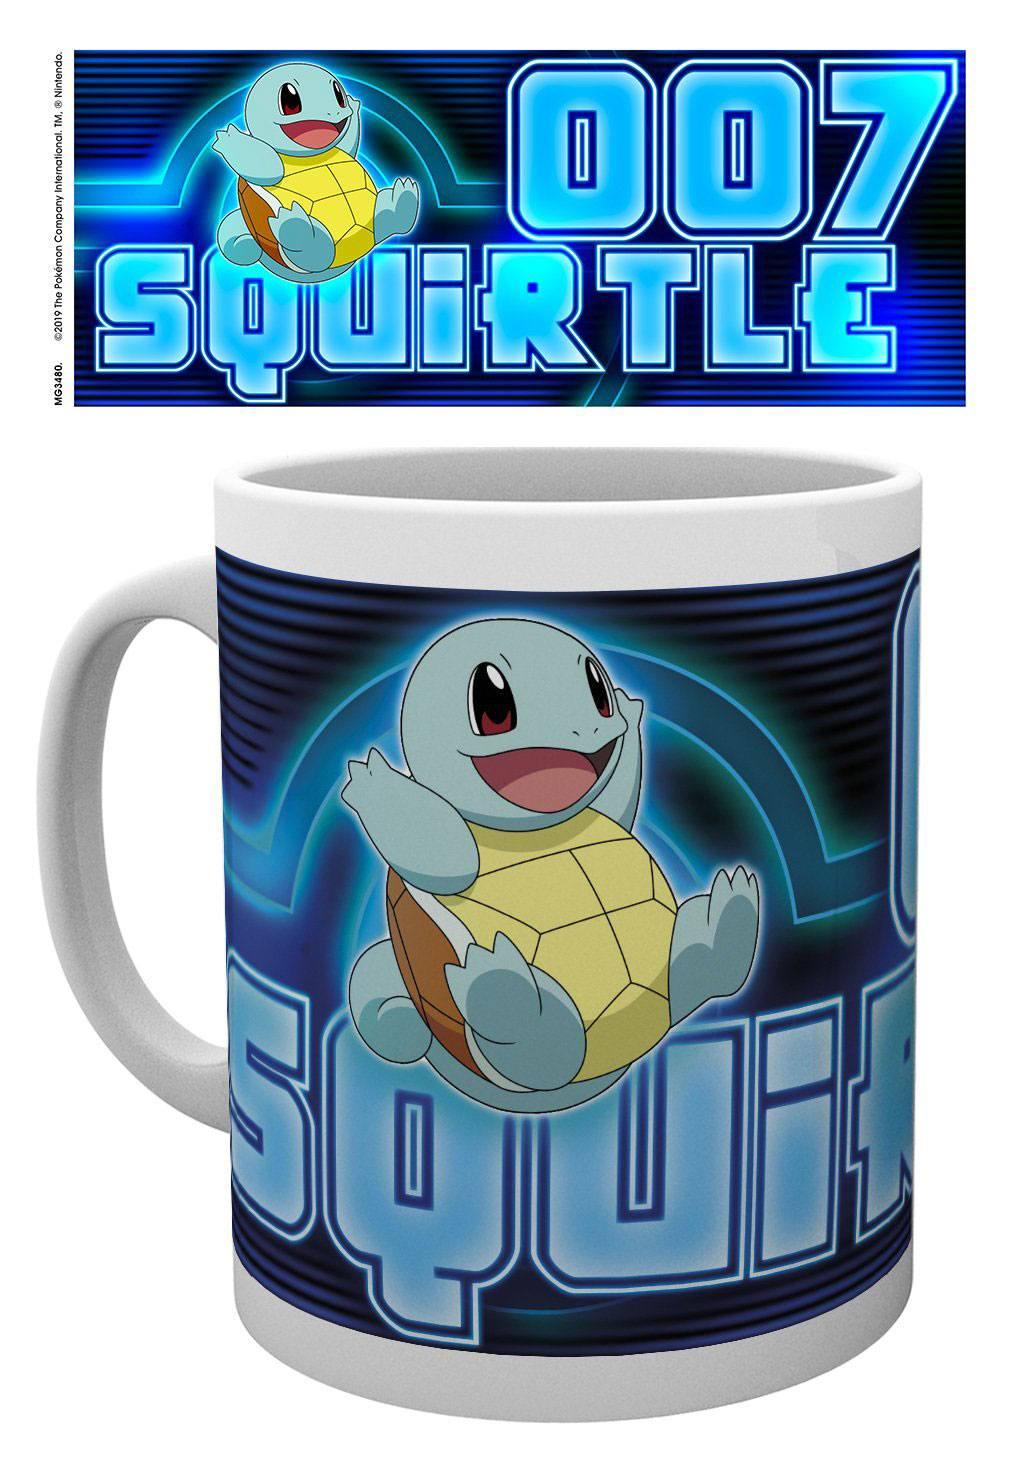 Pokémon Mug Squirtle Glow